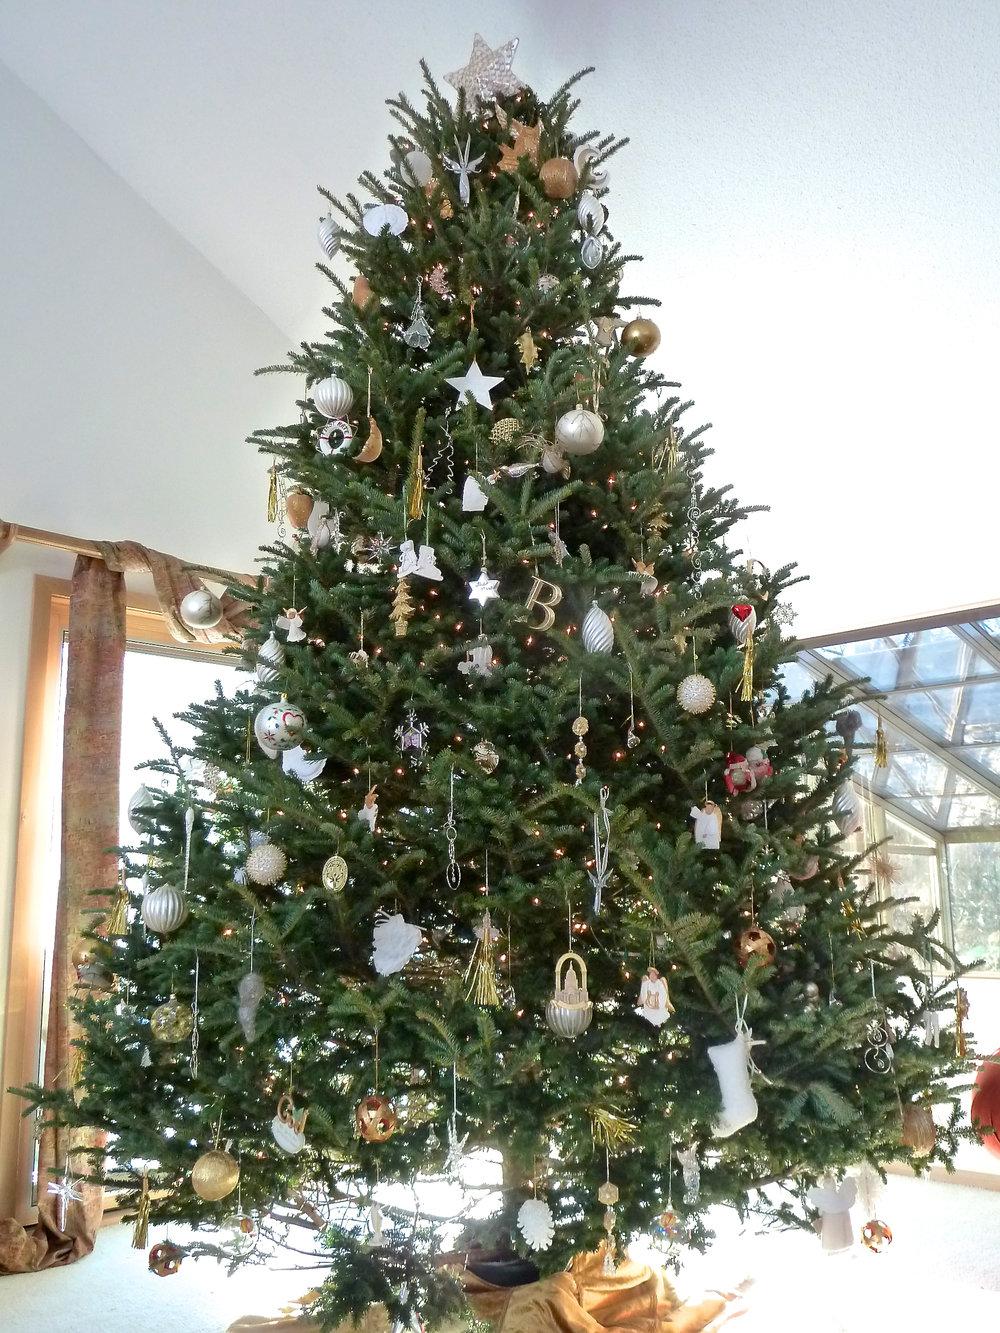 cindi_christmas_LRtree_spiritedtable_photo1.jpg